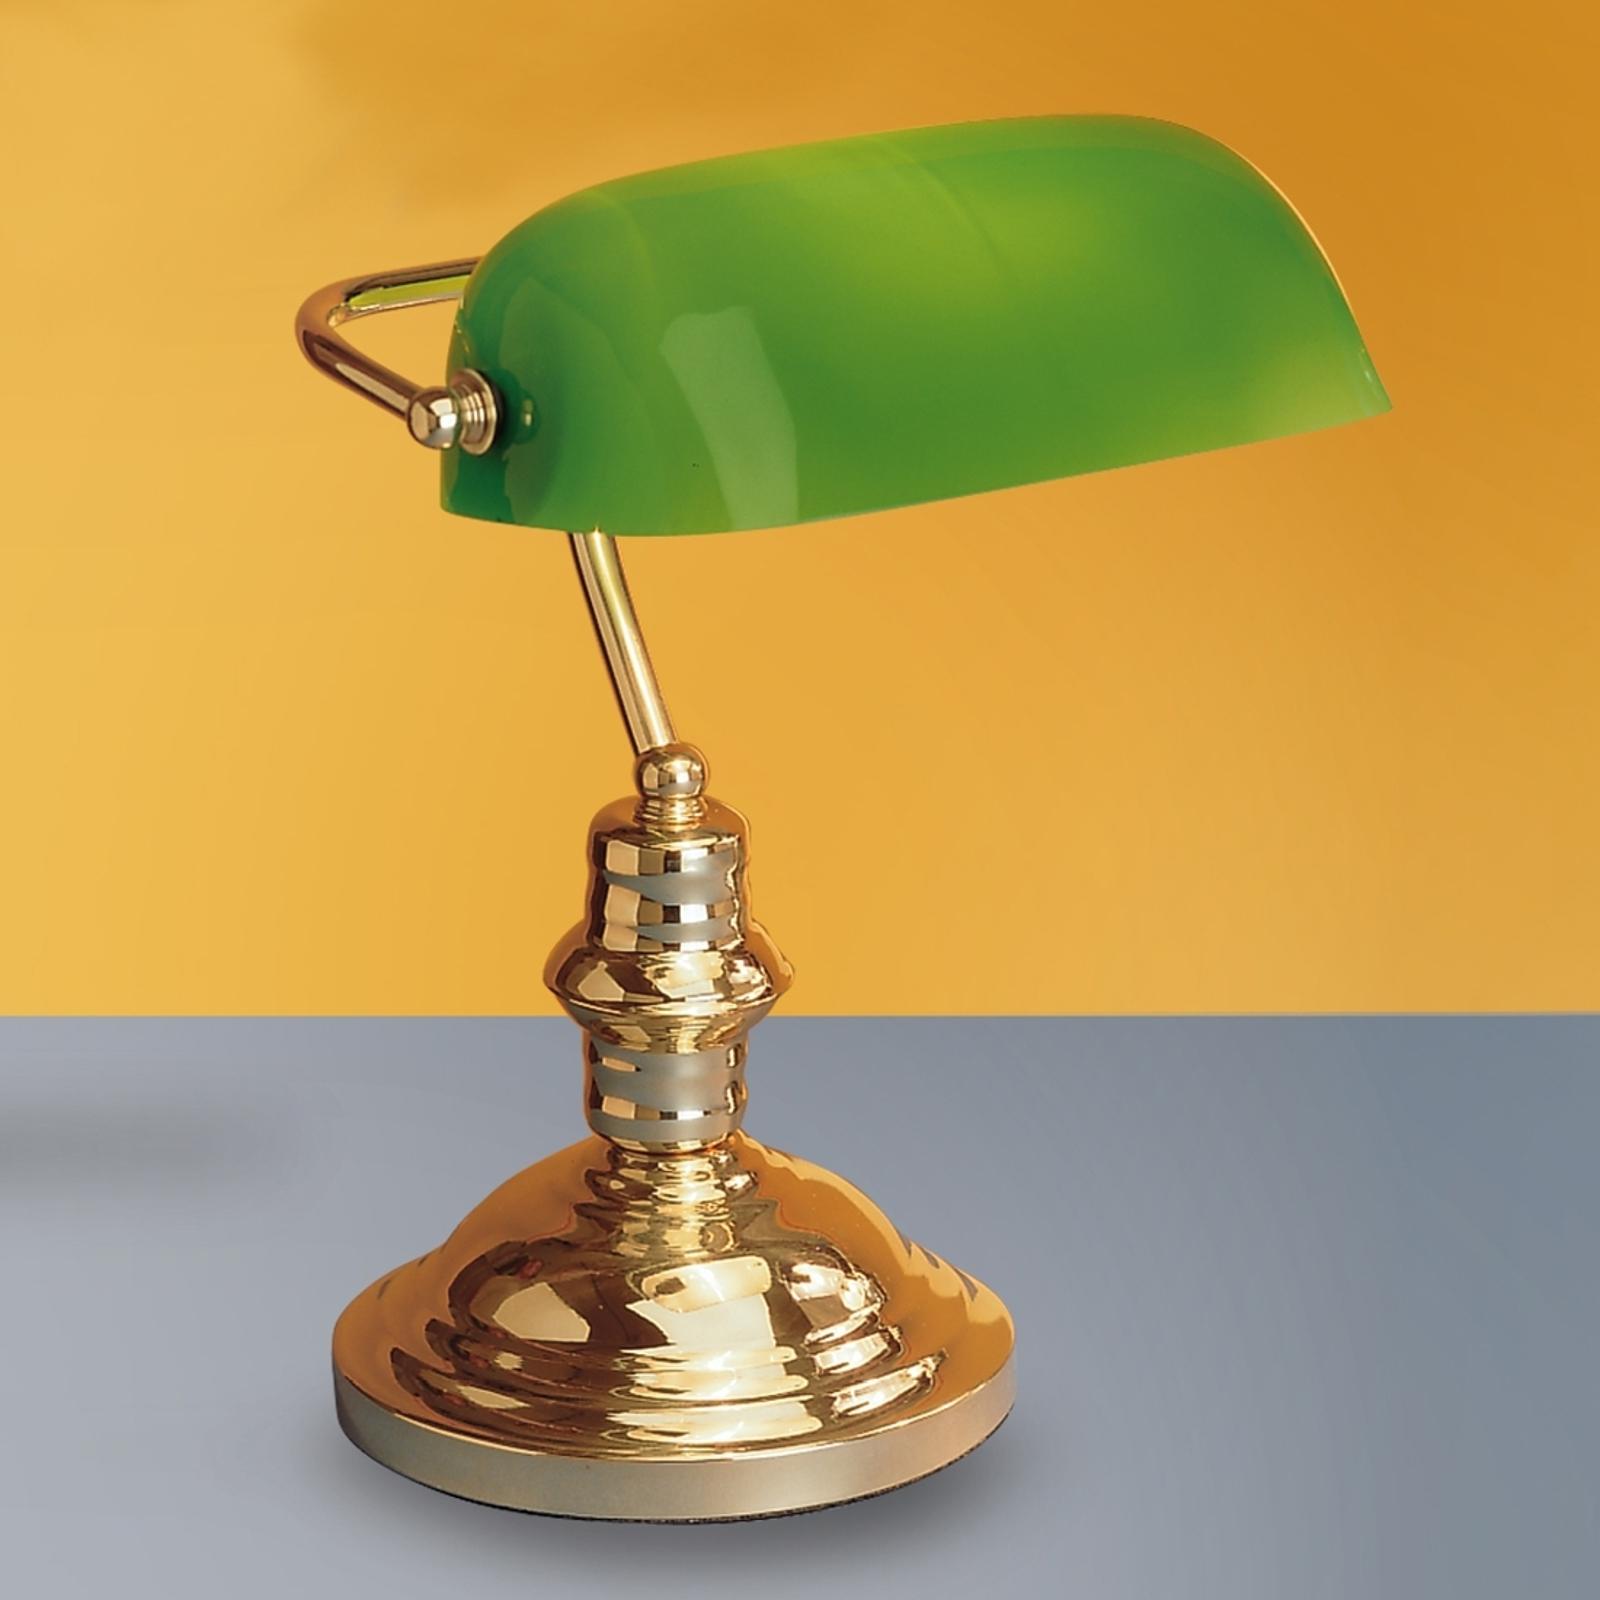 Lampe à poser Onella, vert